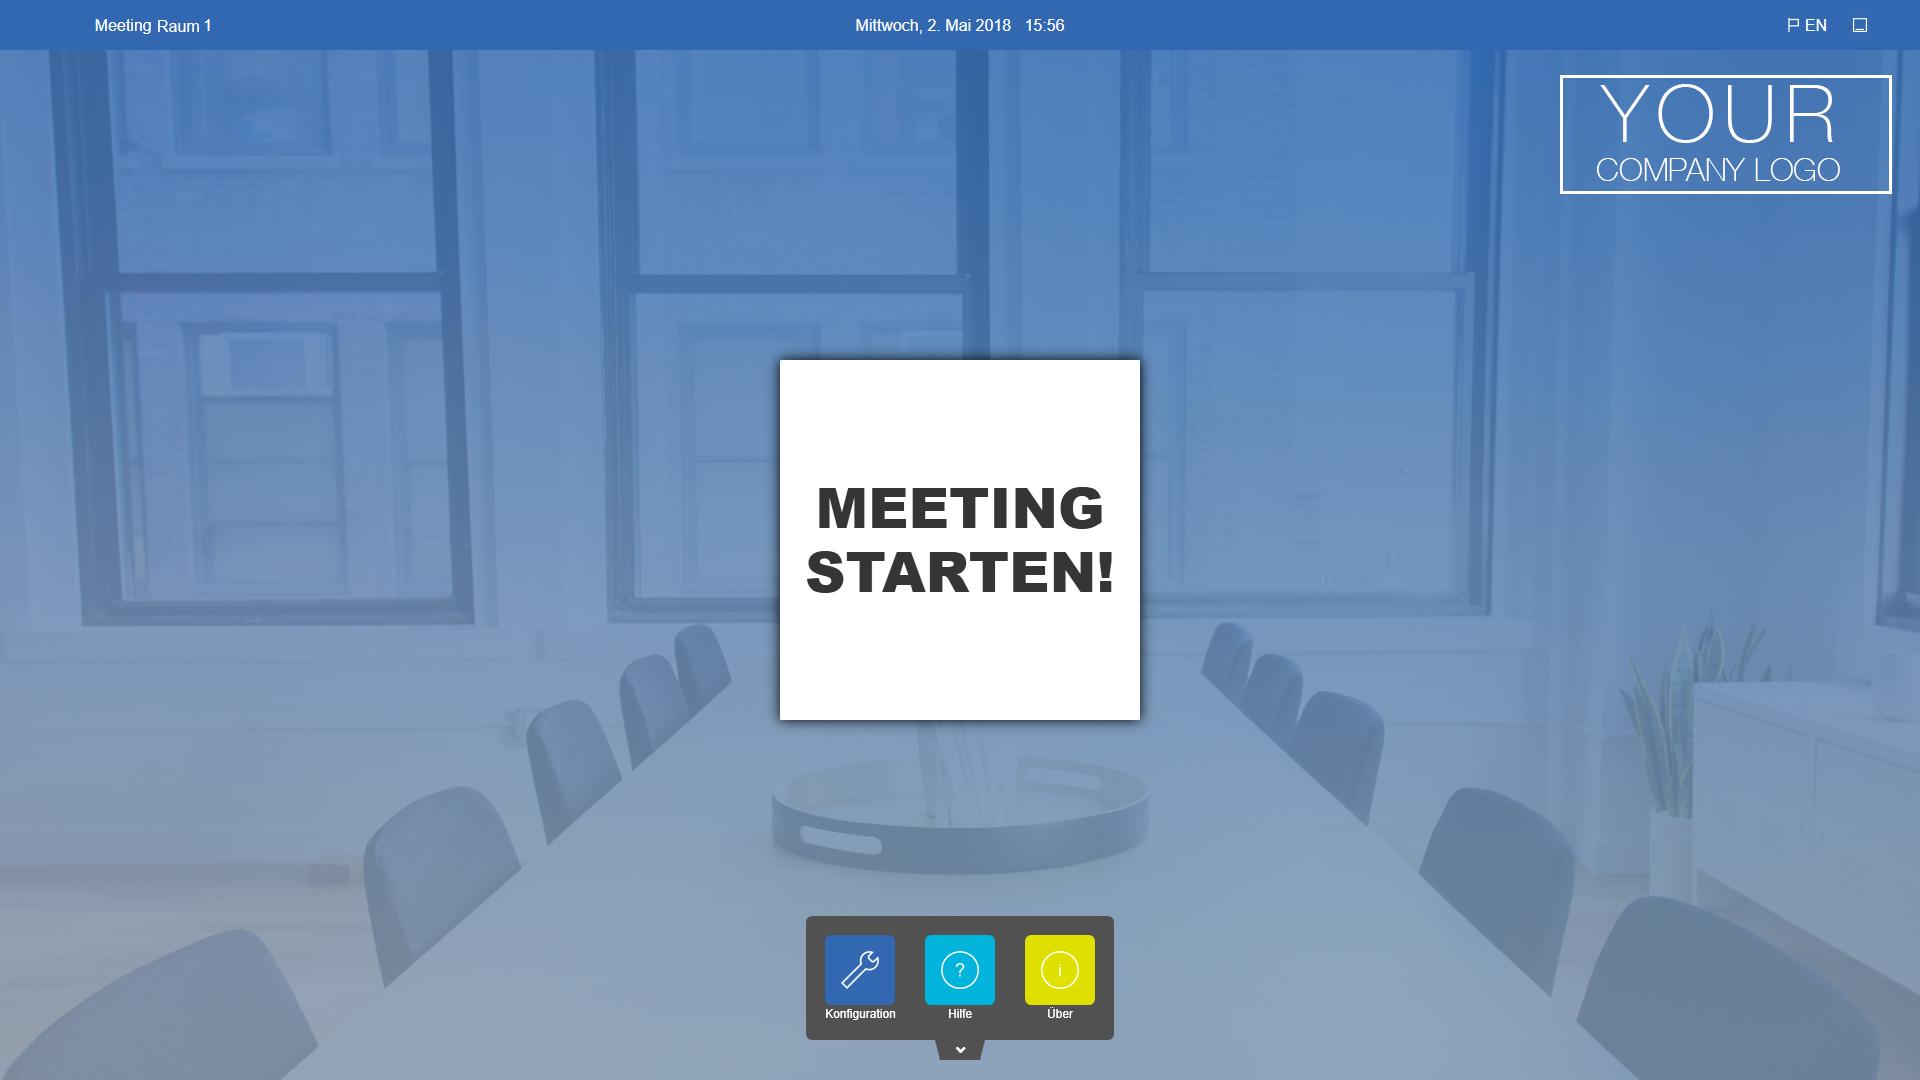 Meeting starten Button-Style